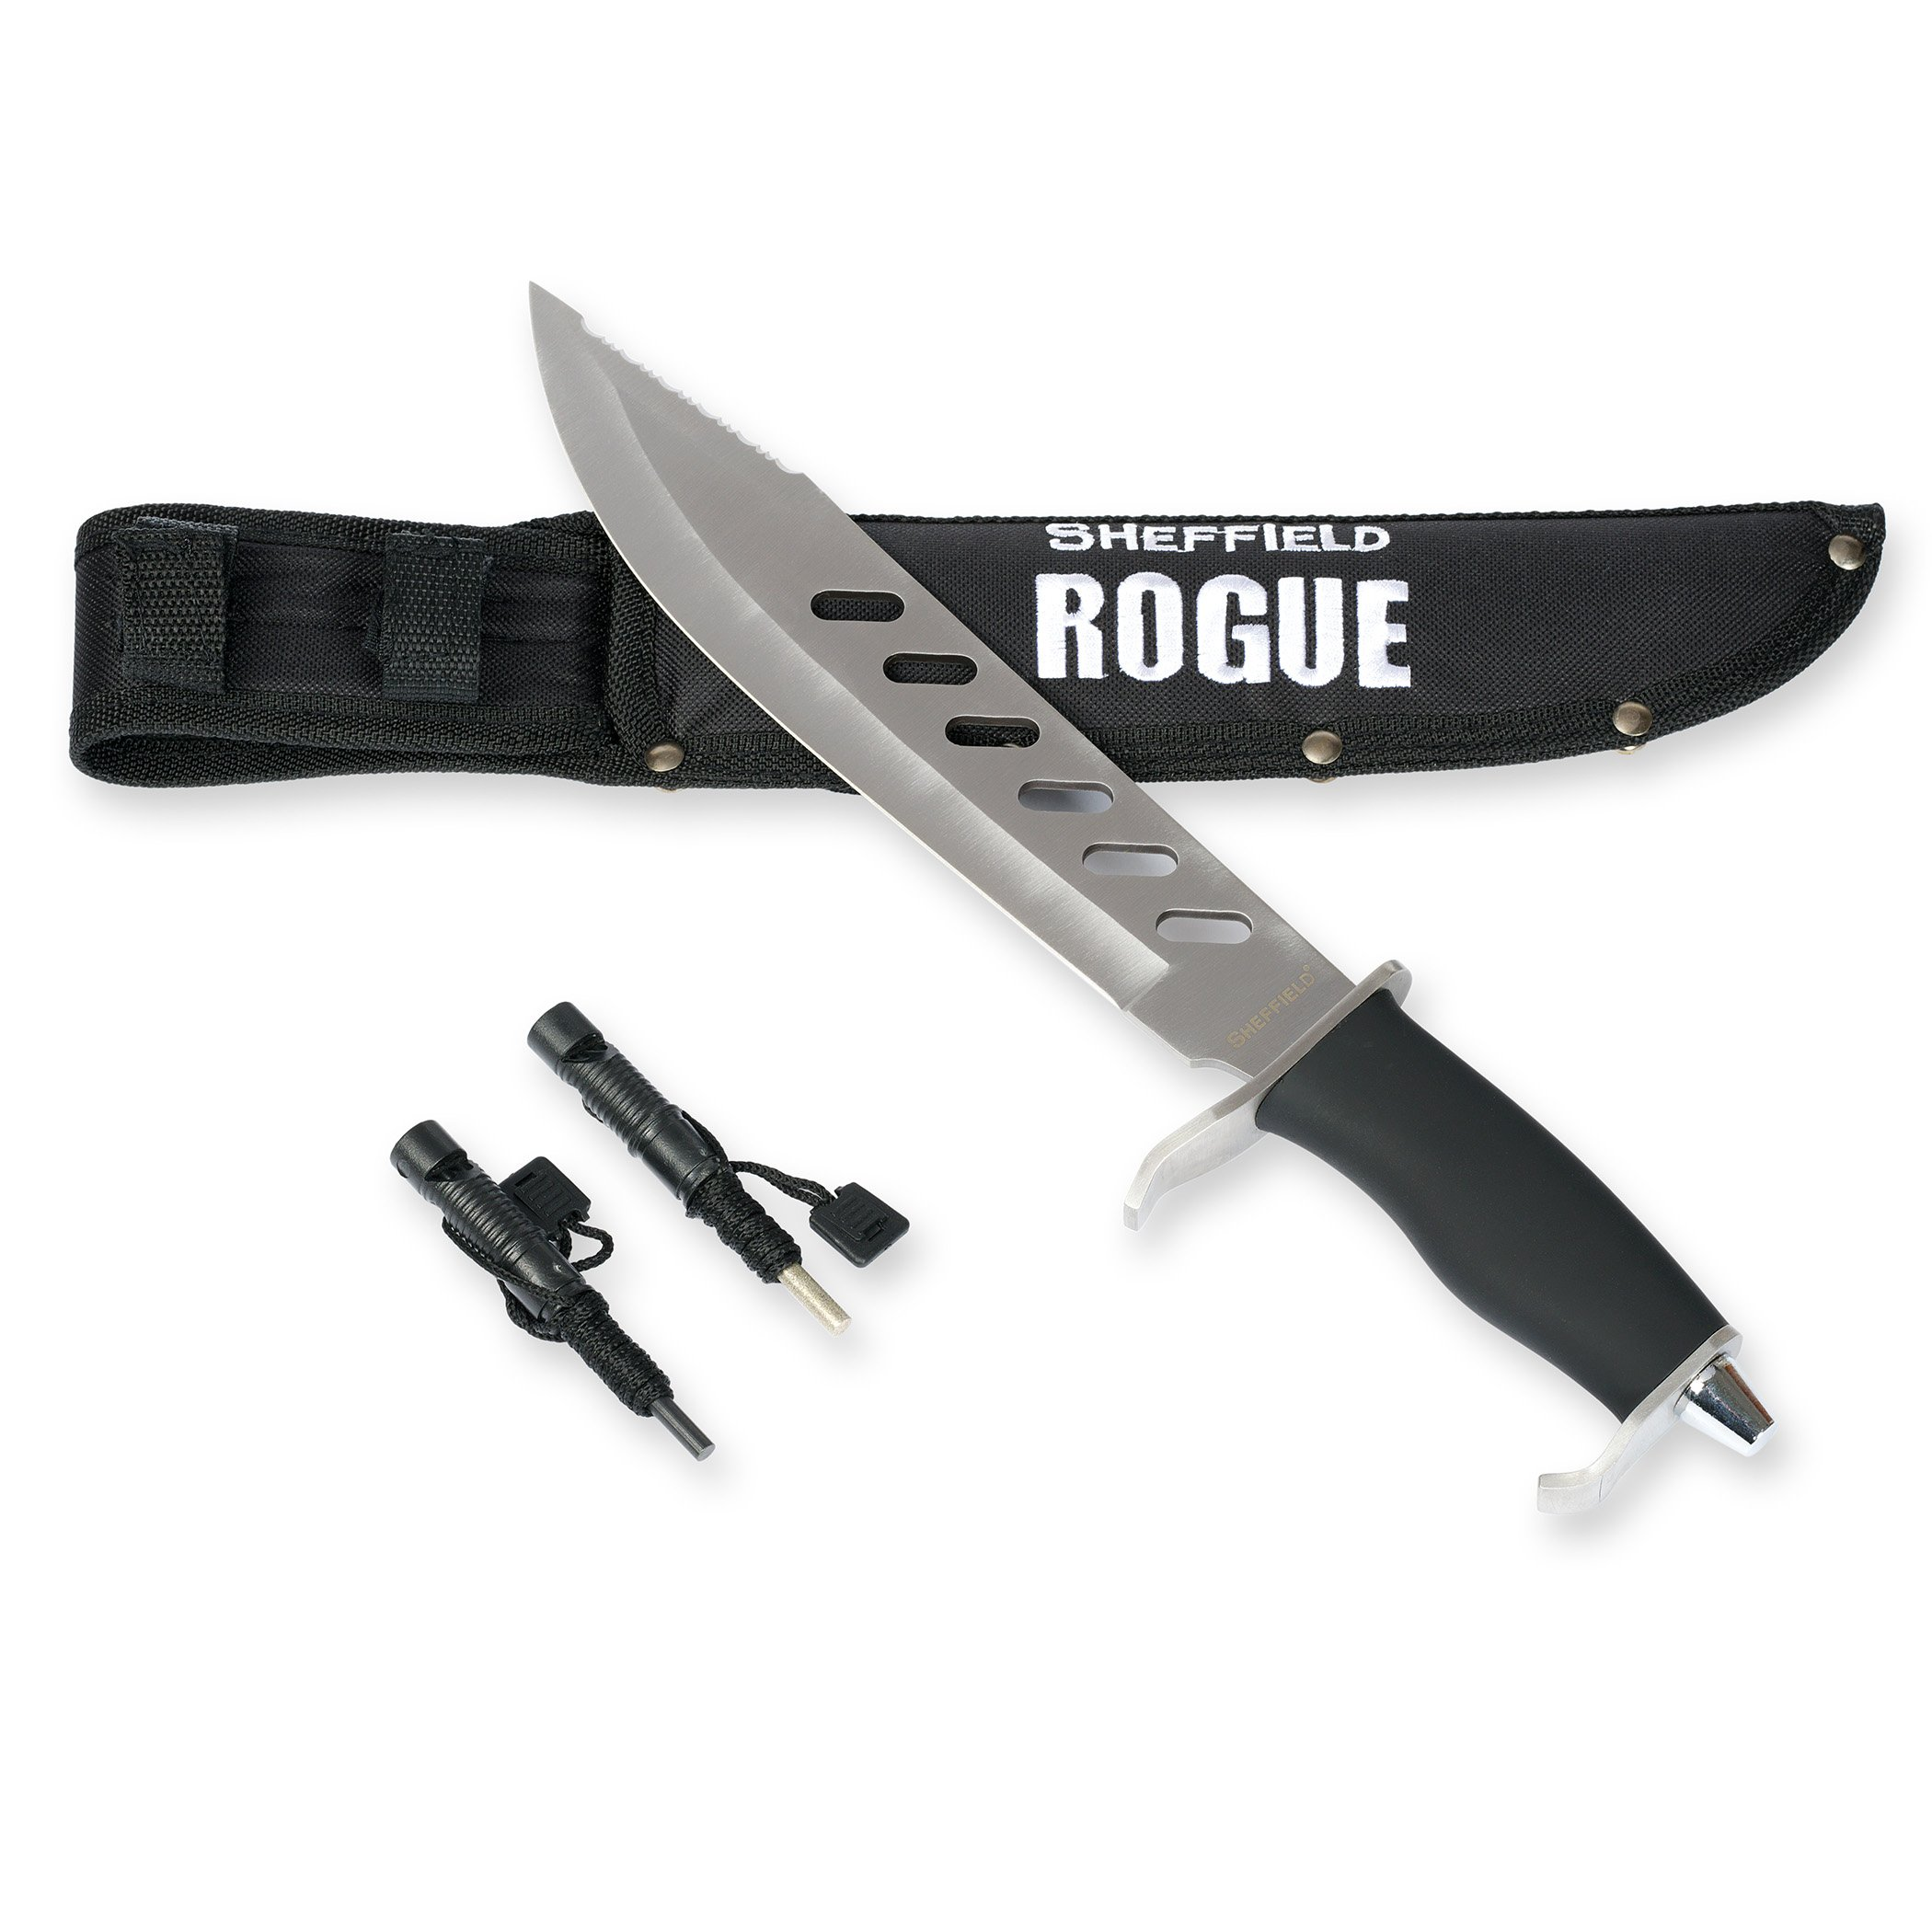 google communities and jaguar knifemaking knives